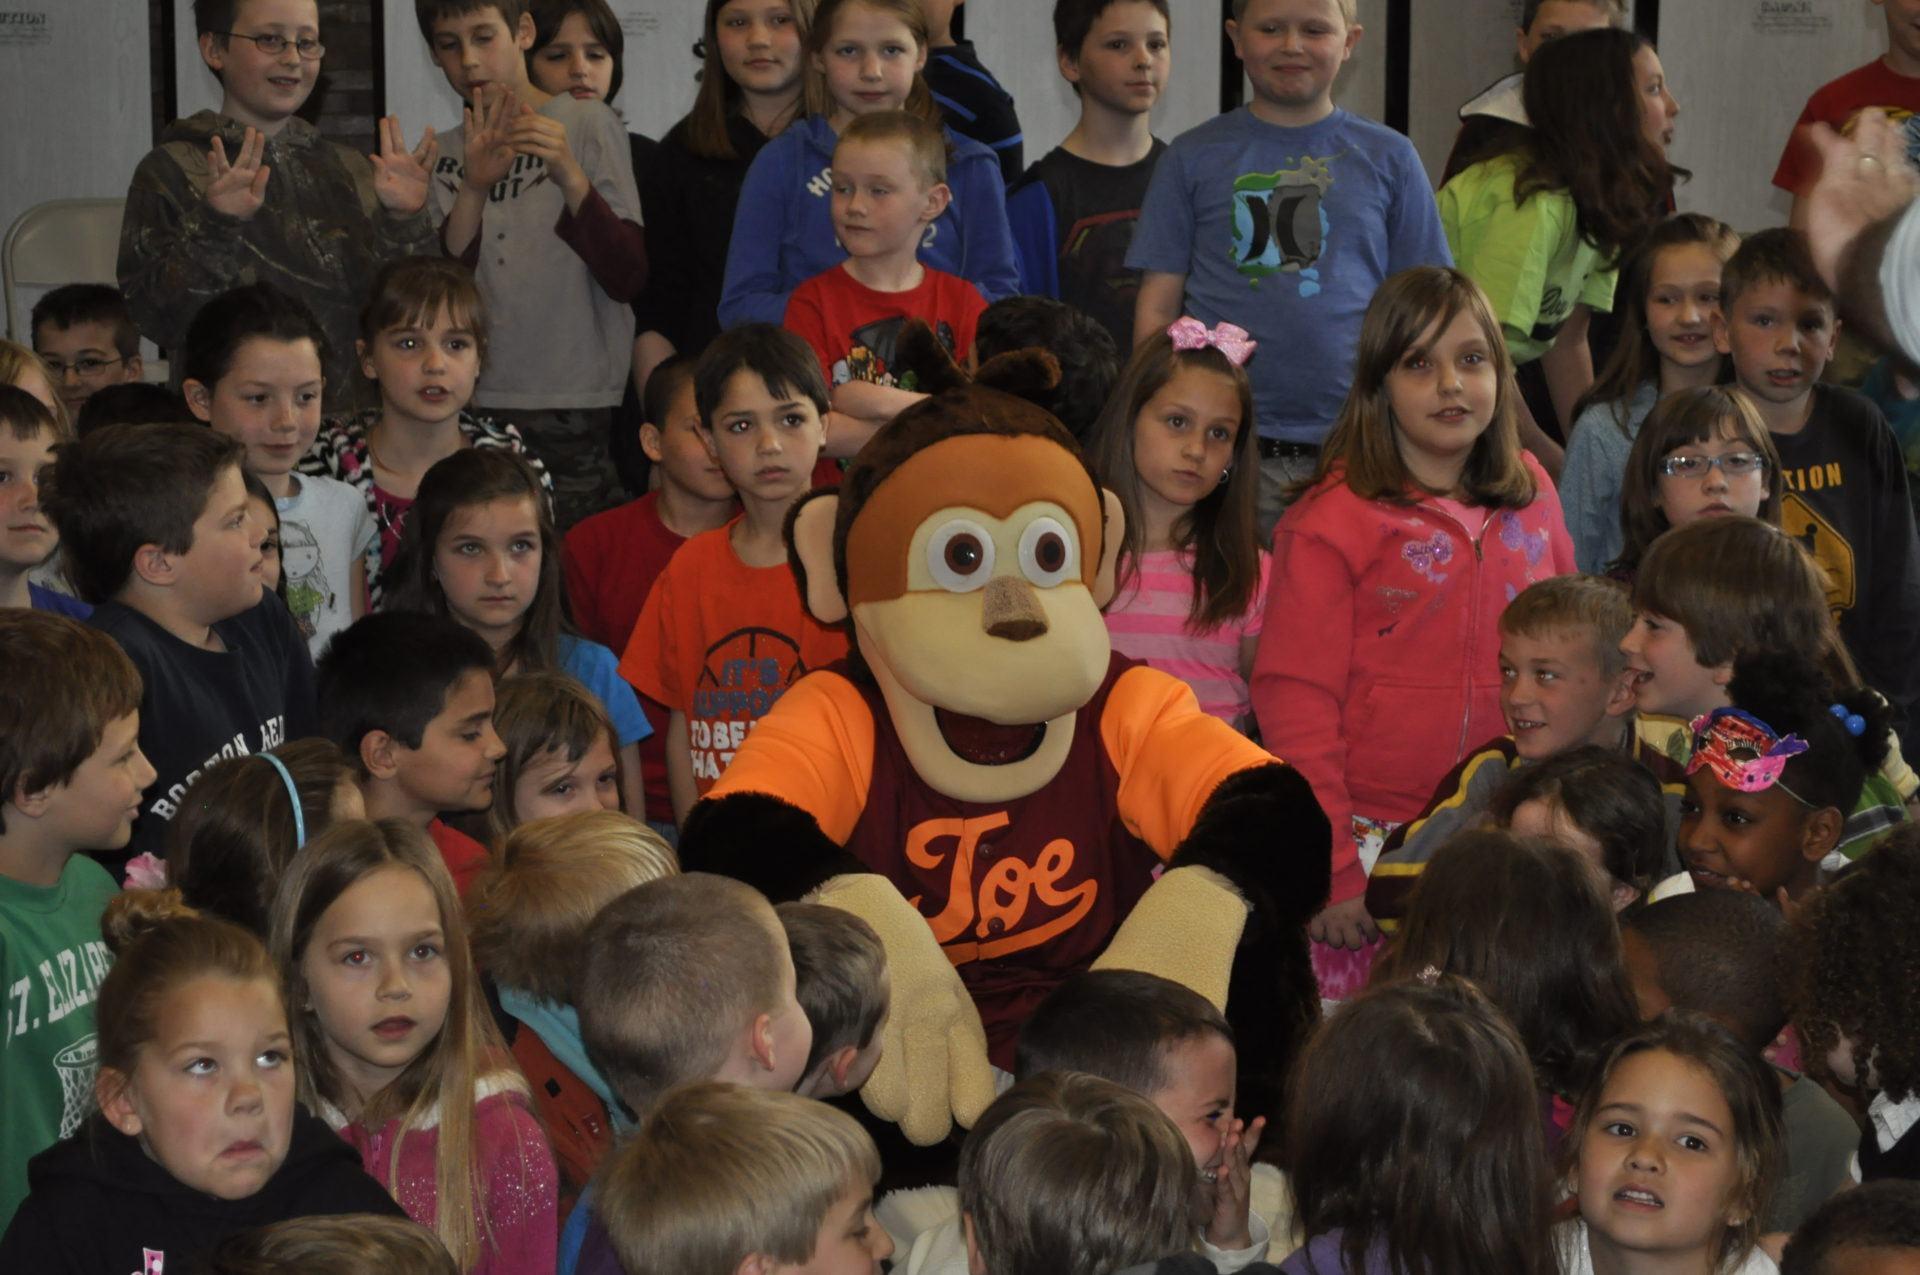 Joe the Monkey and kids.